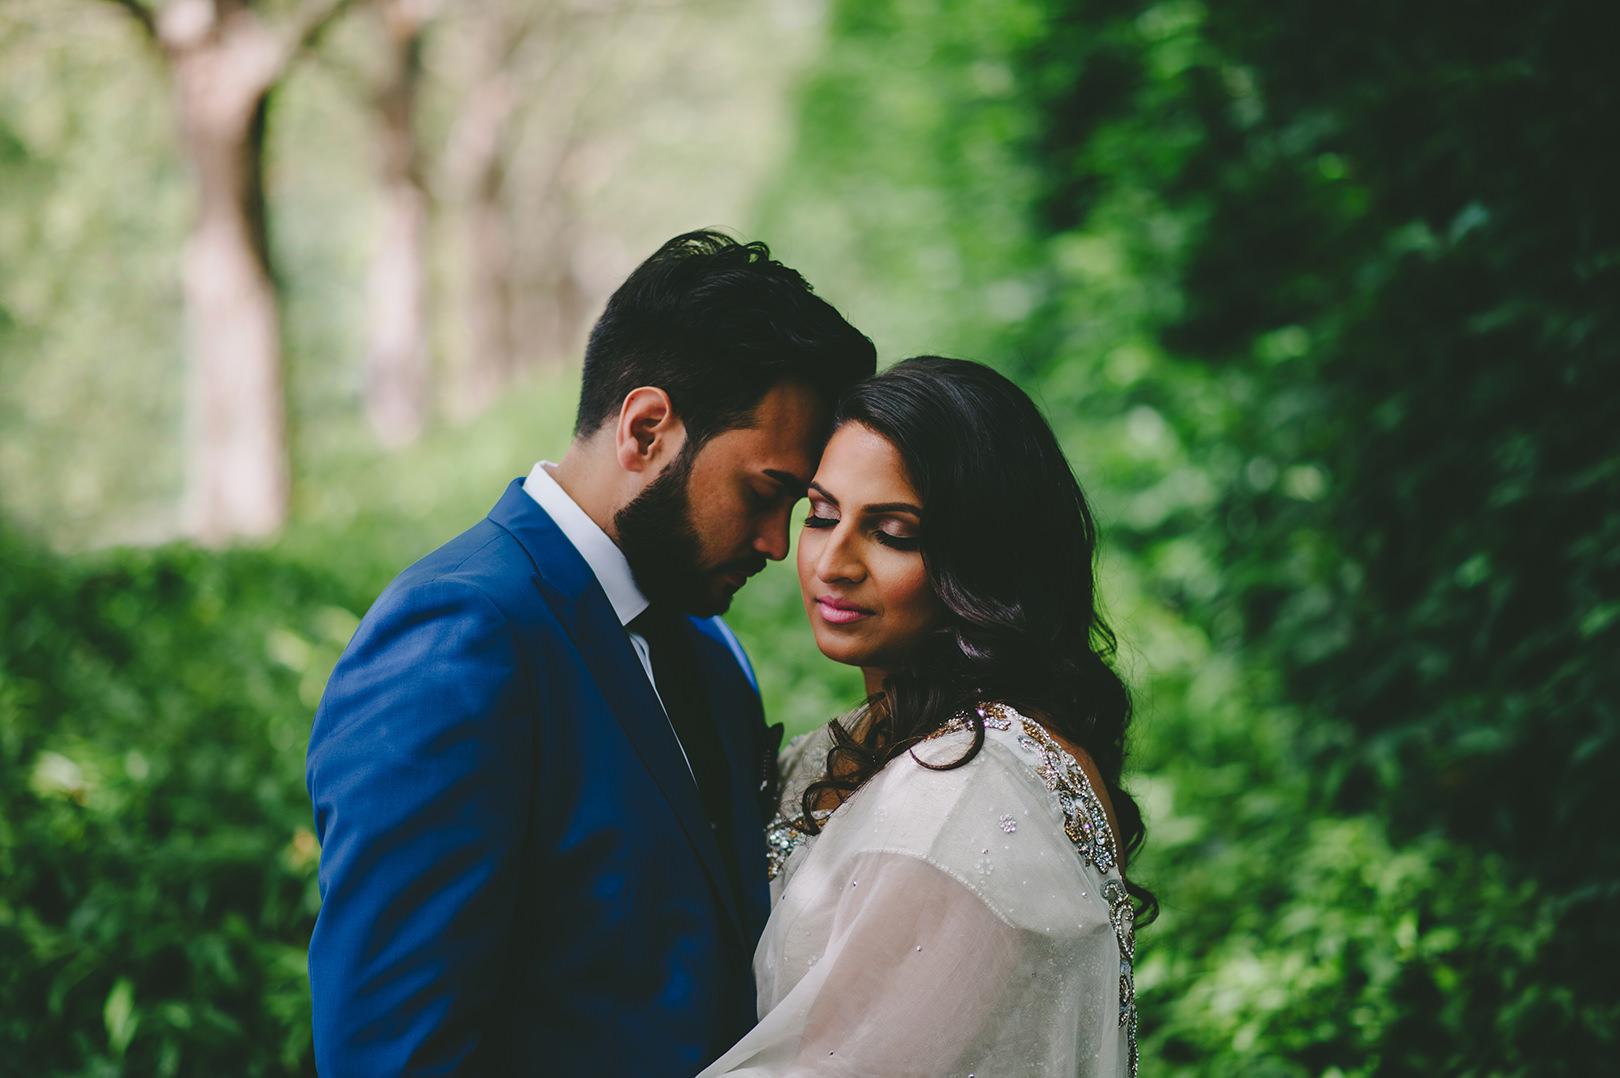 Spain Wedding Photographer - © Dallas Kolotylo Photography - 067